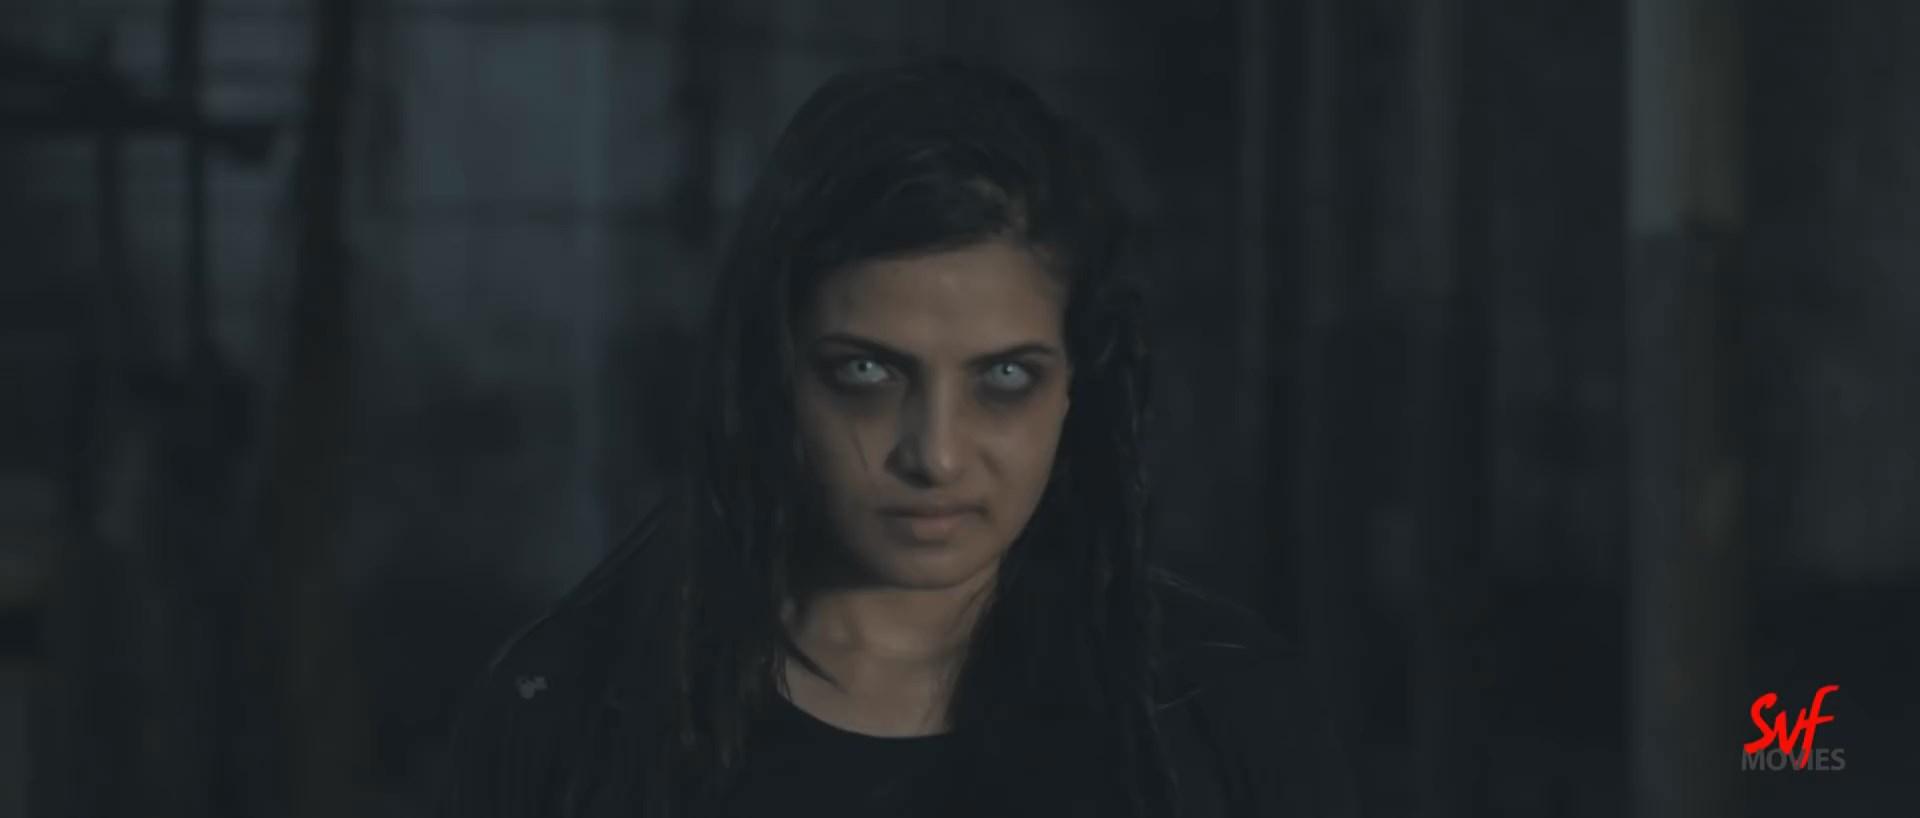 Zombiesthaan 2021 Full Bengali Film.mp4 snapshot 01.29.40.000